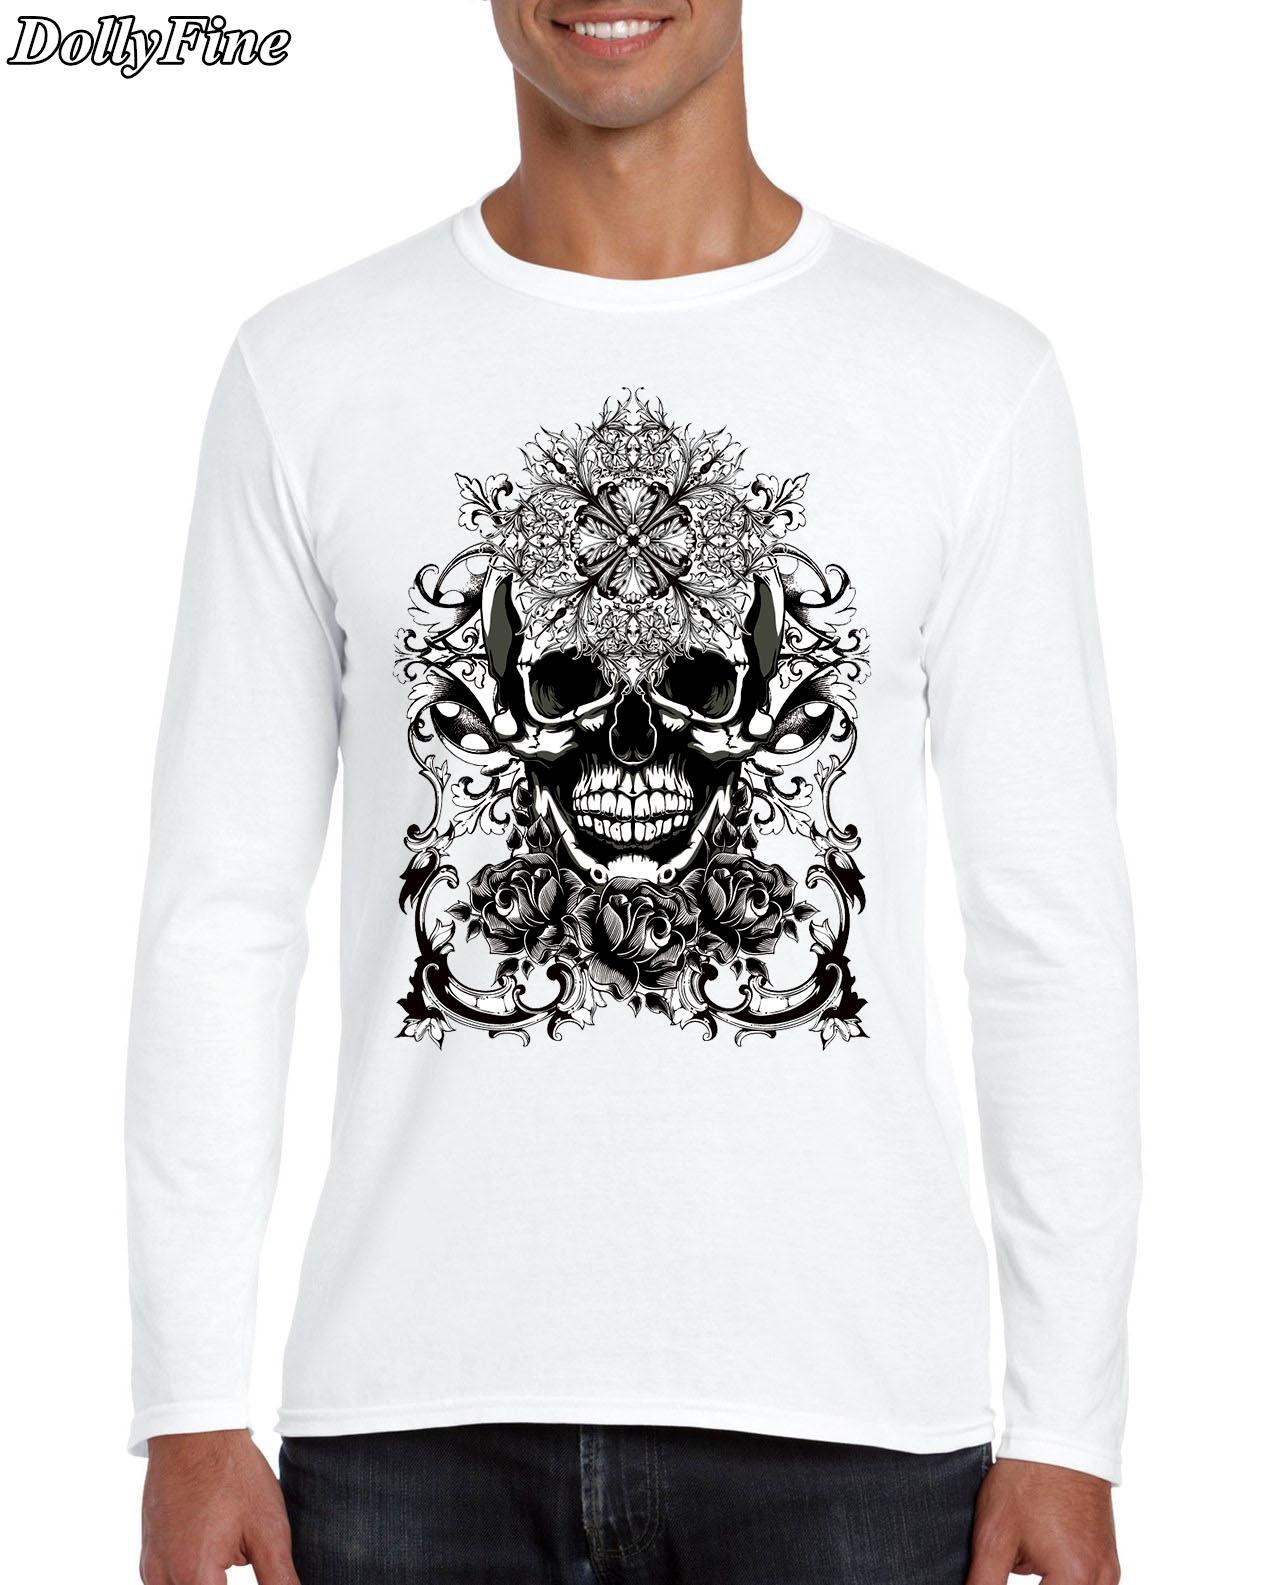 Shirts human design - New Color Human Skeleton Design Men S T Shirt Cool Fashion Tops Long Sleeve Tees Printed Funny